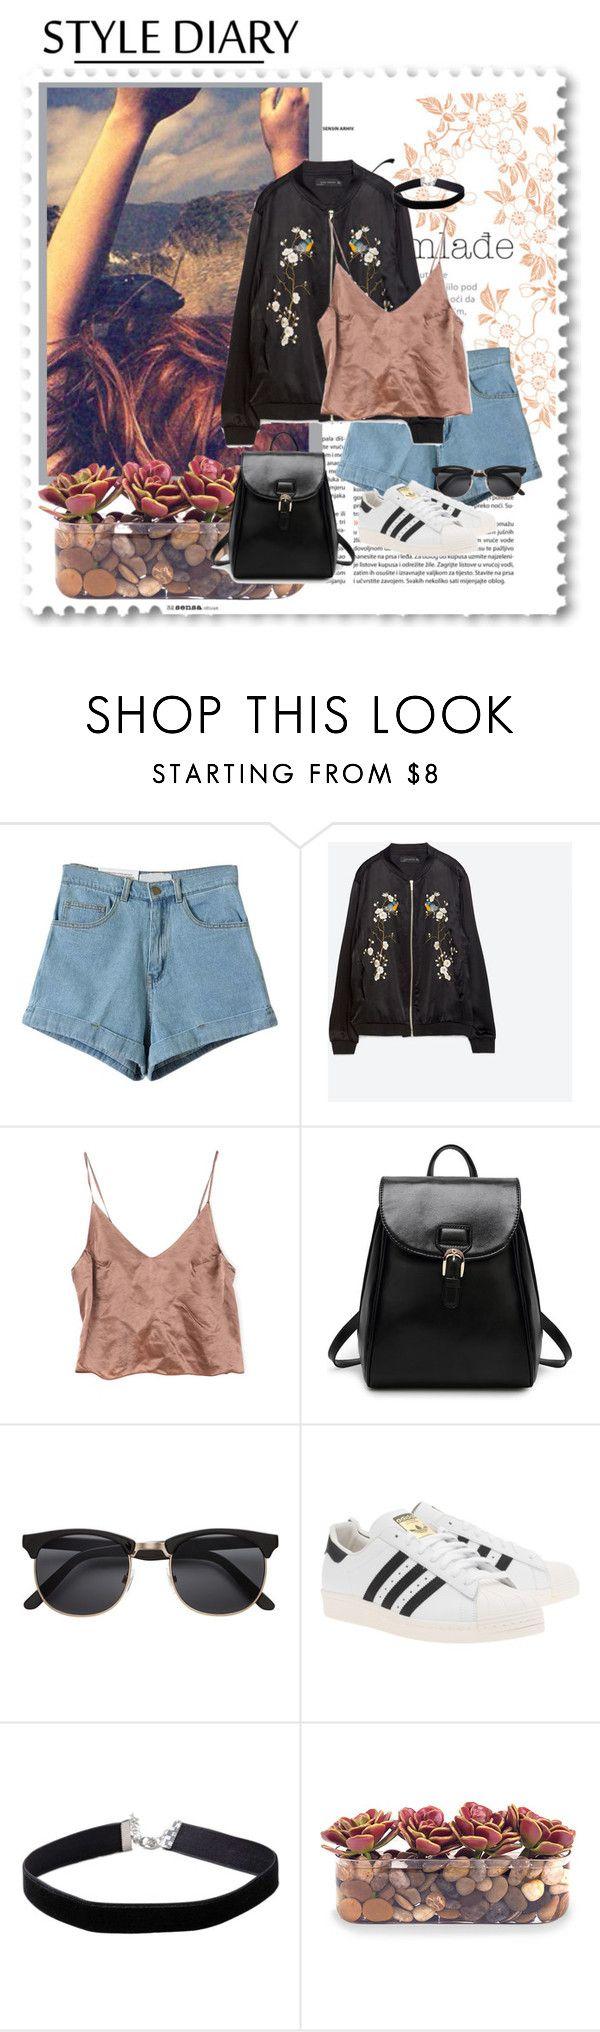 """Style Diary: Roadtrip"" by blondeshoopaholic on Polyvore featuring moda, Zara, adidas Originals, Miss Selfridge e John-Richard"